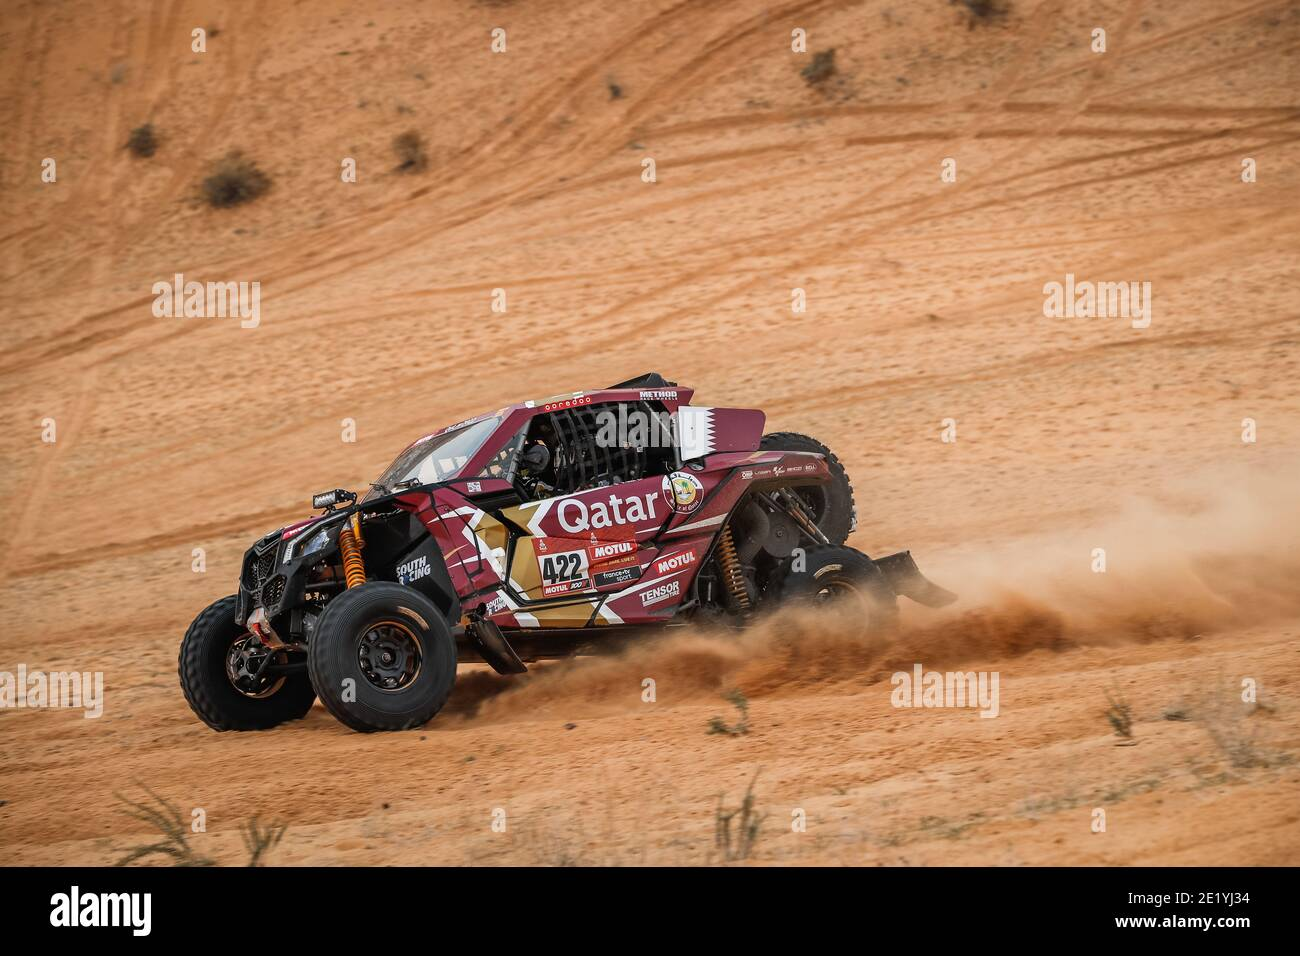 Dakar et rally-raid - Page 12 422-al-attiyah-nasser-khalifa-qat-ceci-paolo-ita-can-am-south-racing-can-am-motul-ssv-series-t4-action-during-the-7th-stage-of-the-dakar-2021-between-ha039il-and-sakaka-in-saudi-arabia-on-january-10-2021-photo-antonin-vincent-dppi-lm-2E1YJ34